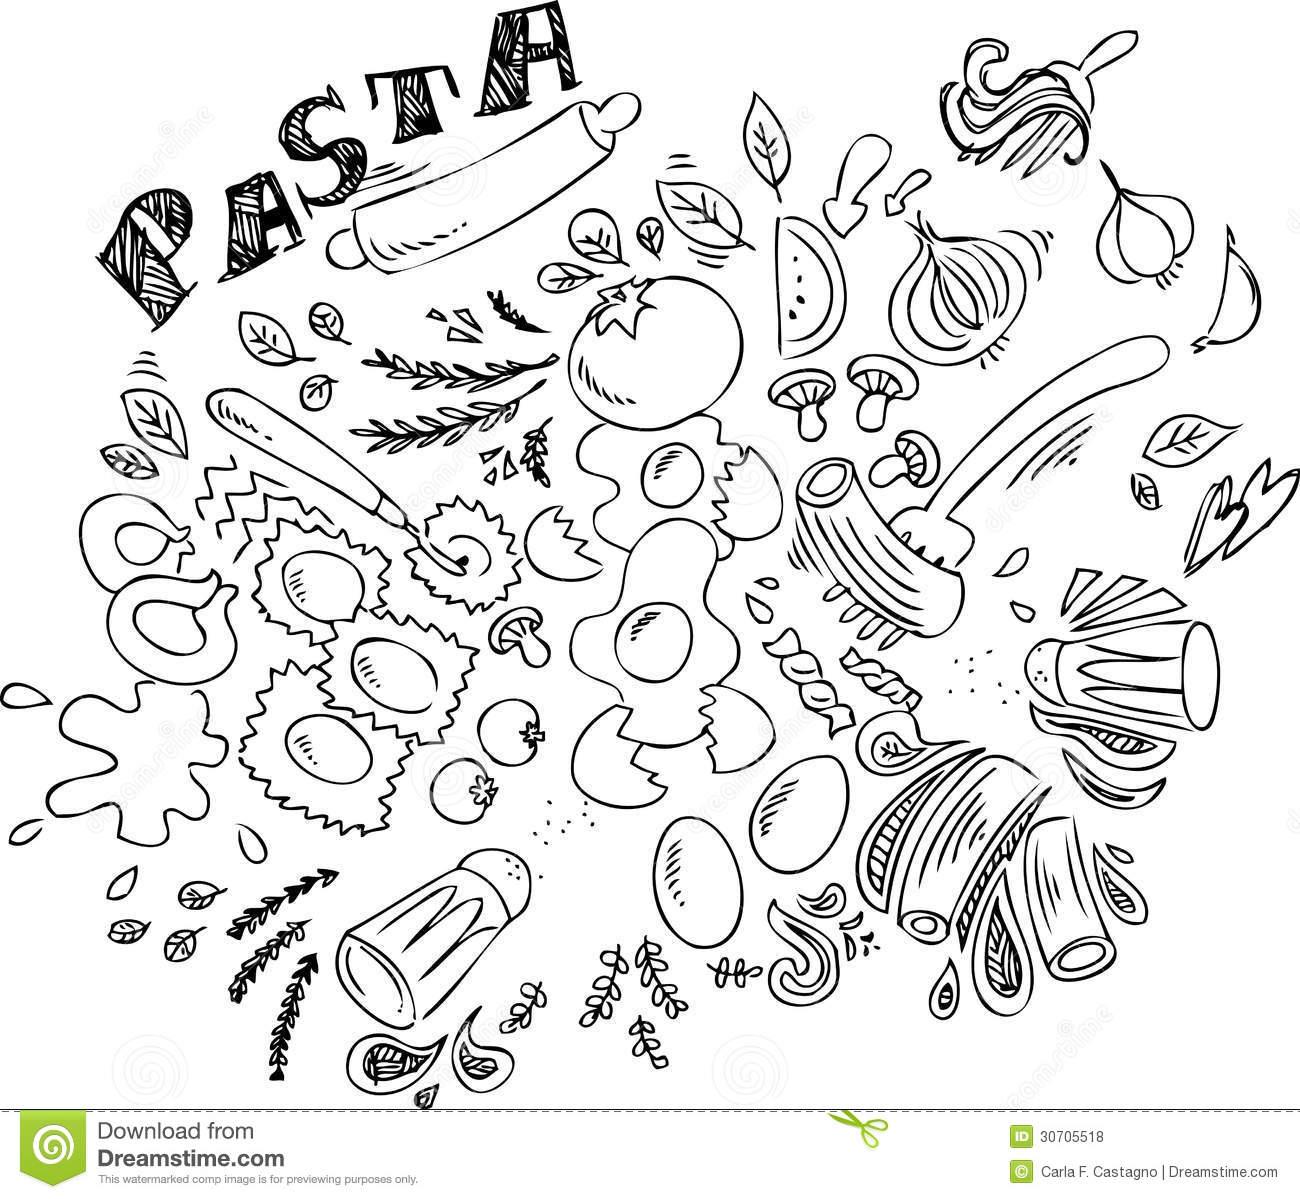 Spaghetti Food Clipart Black And White 20 Free Cliparts